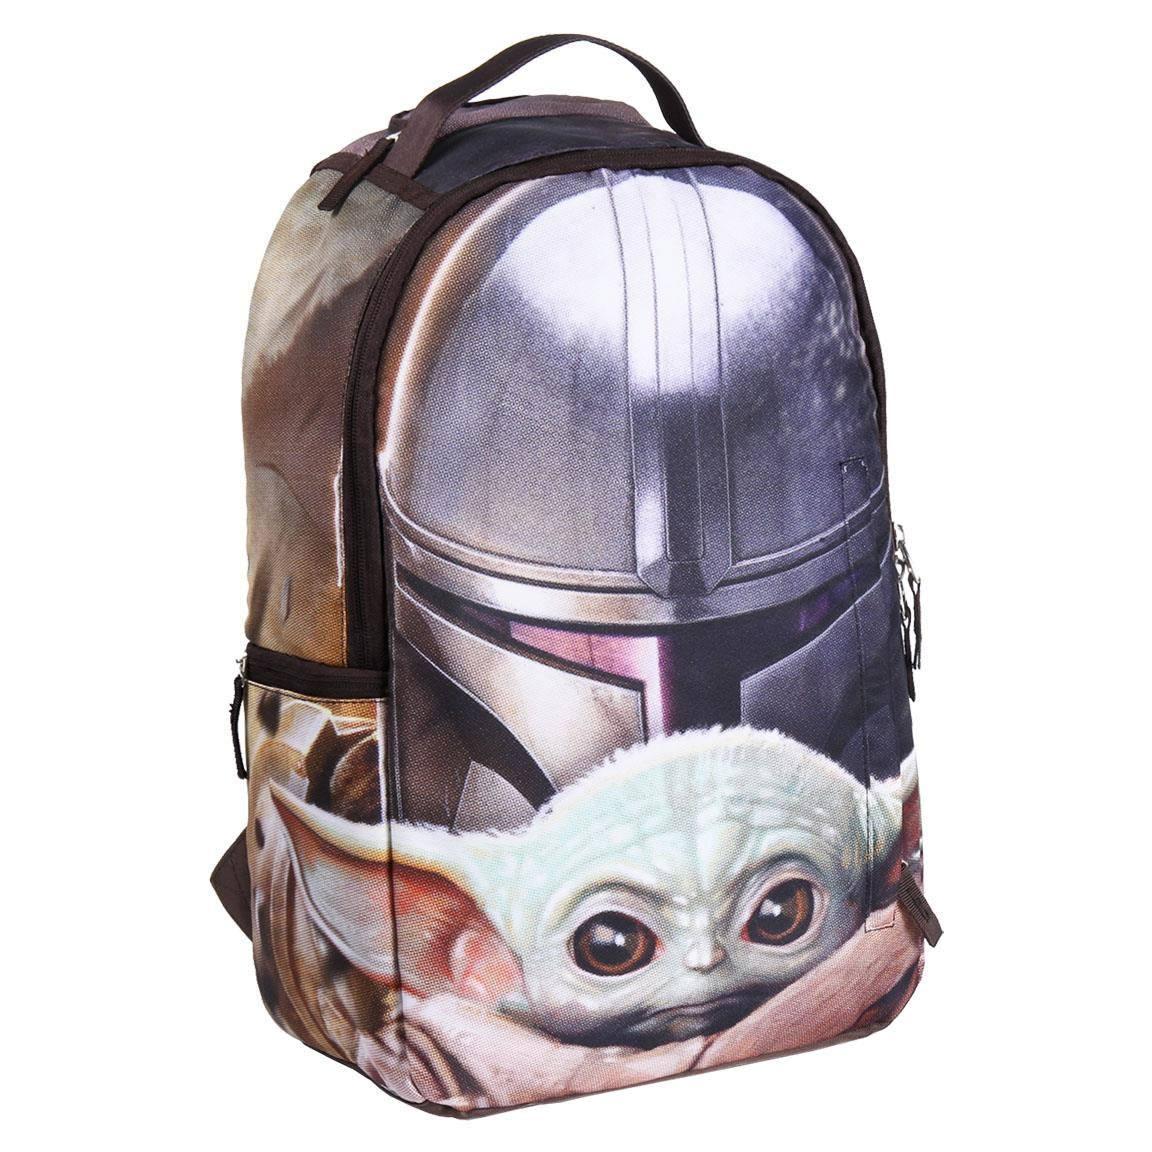 Star Wars The Mandalorian Backpack The Mandalorian & Grogu